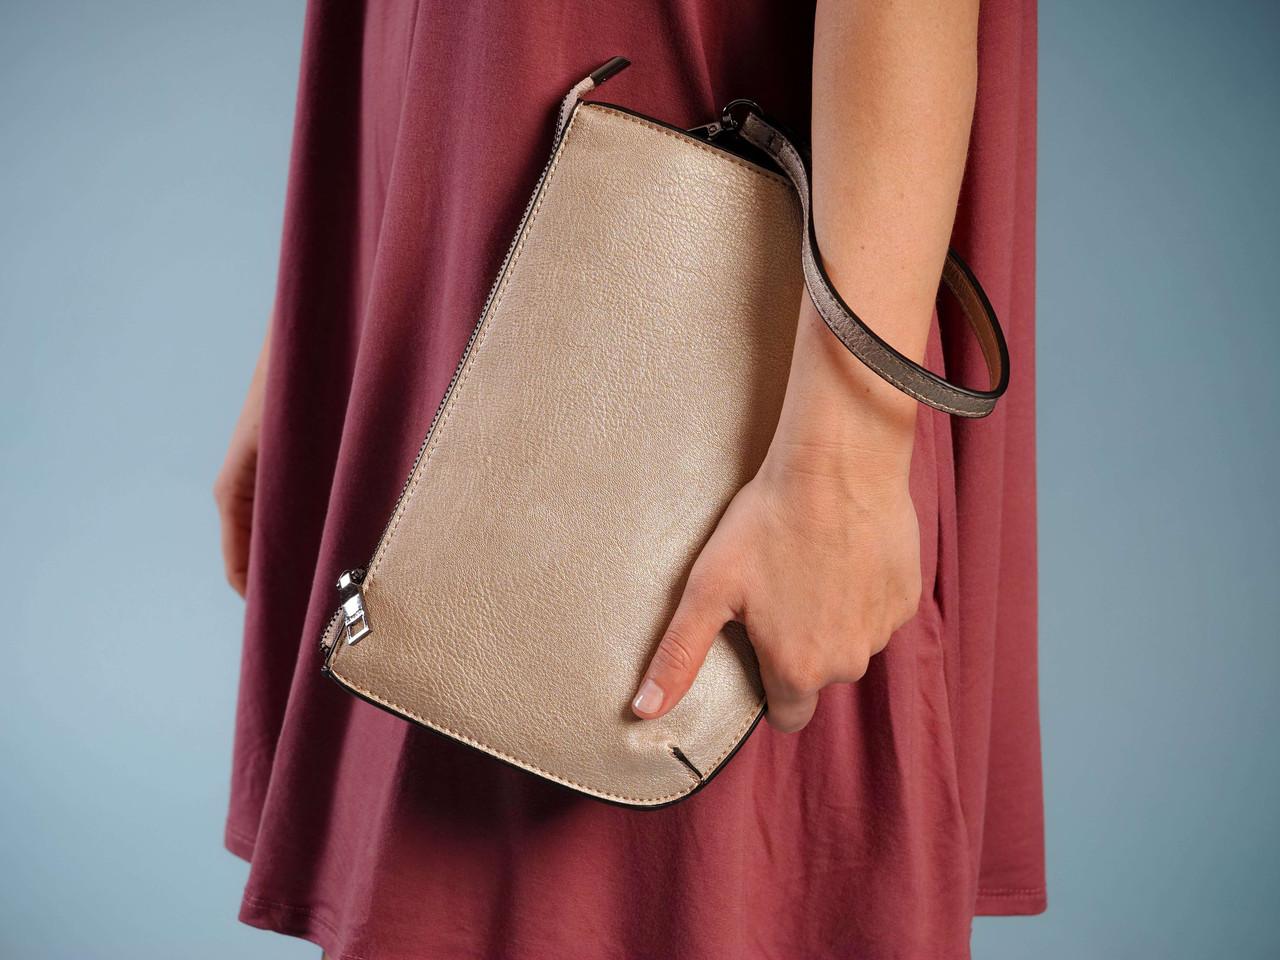 vegan leather wristlet crossbody three crompartments pockets